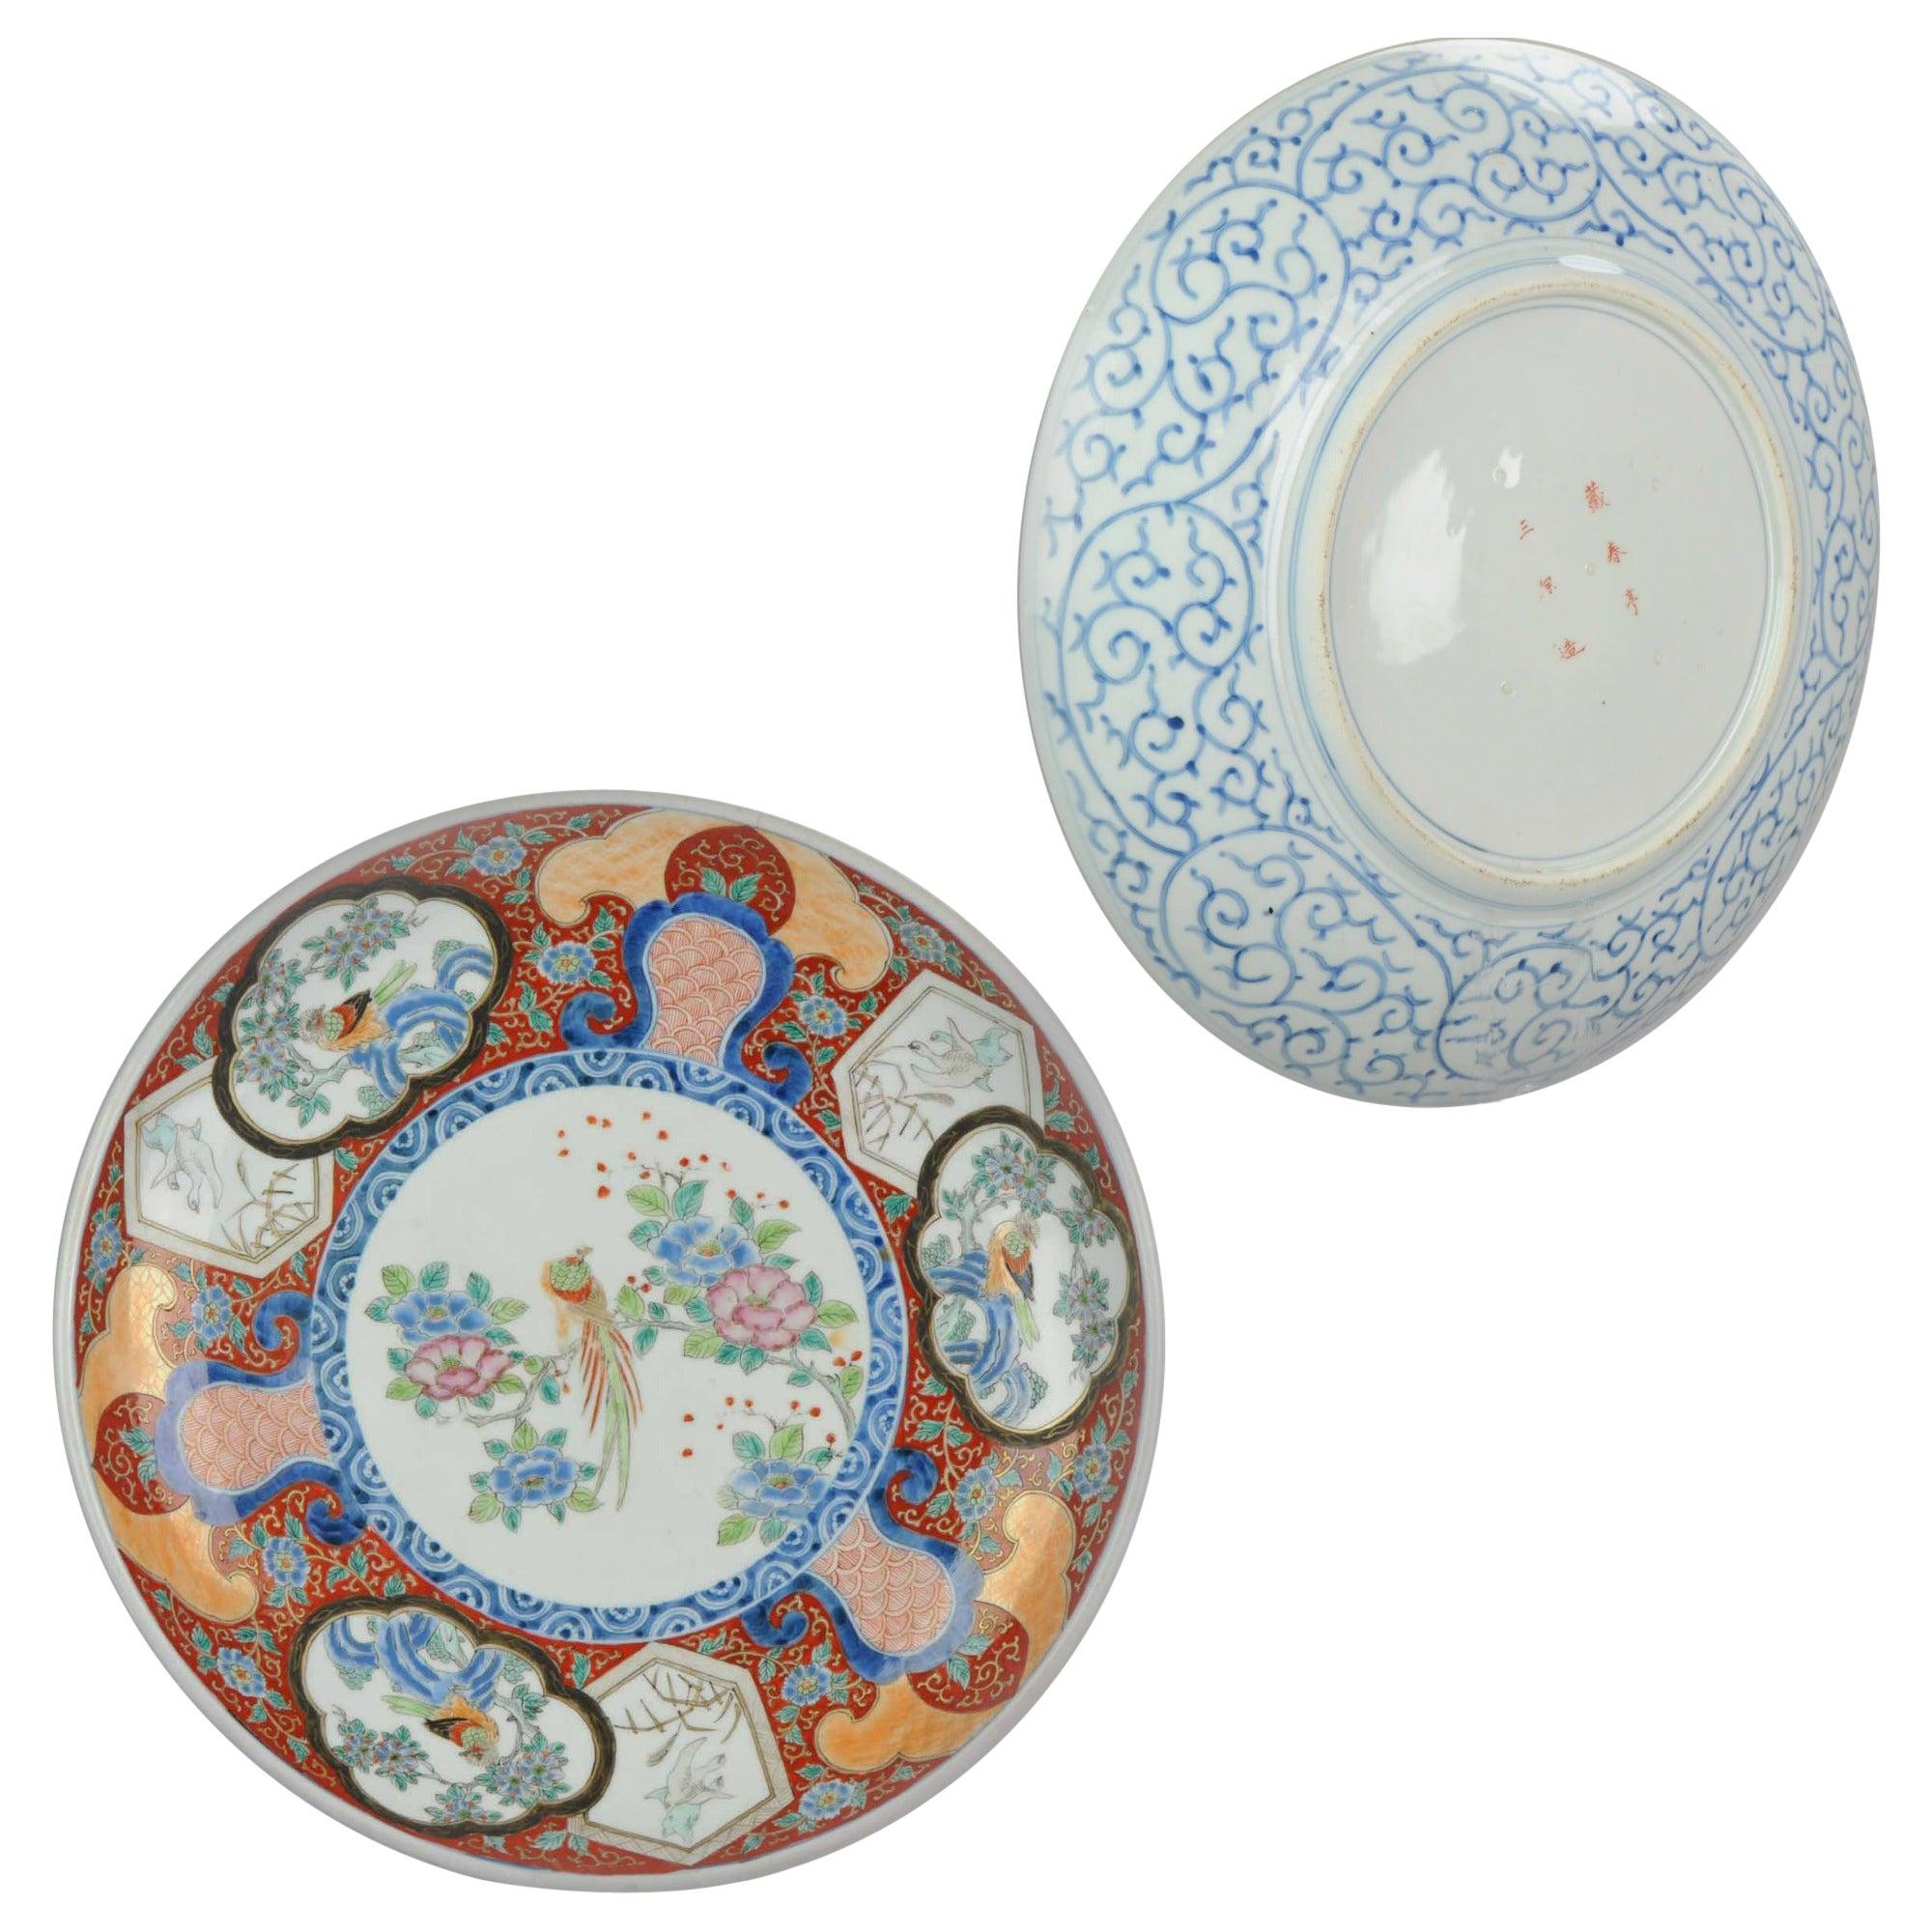 Japanese Porcelain Meiji Taisho Charger Marked Antique Japan Blue Arita